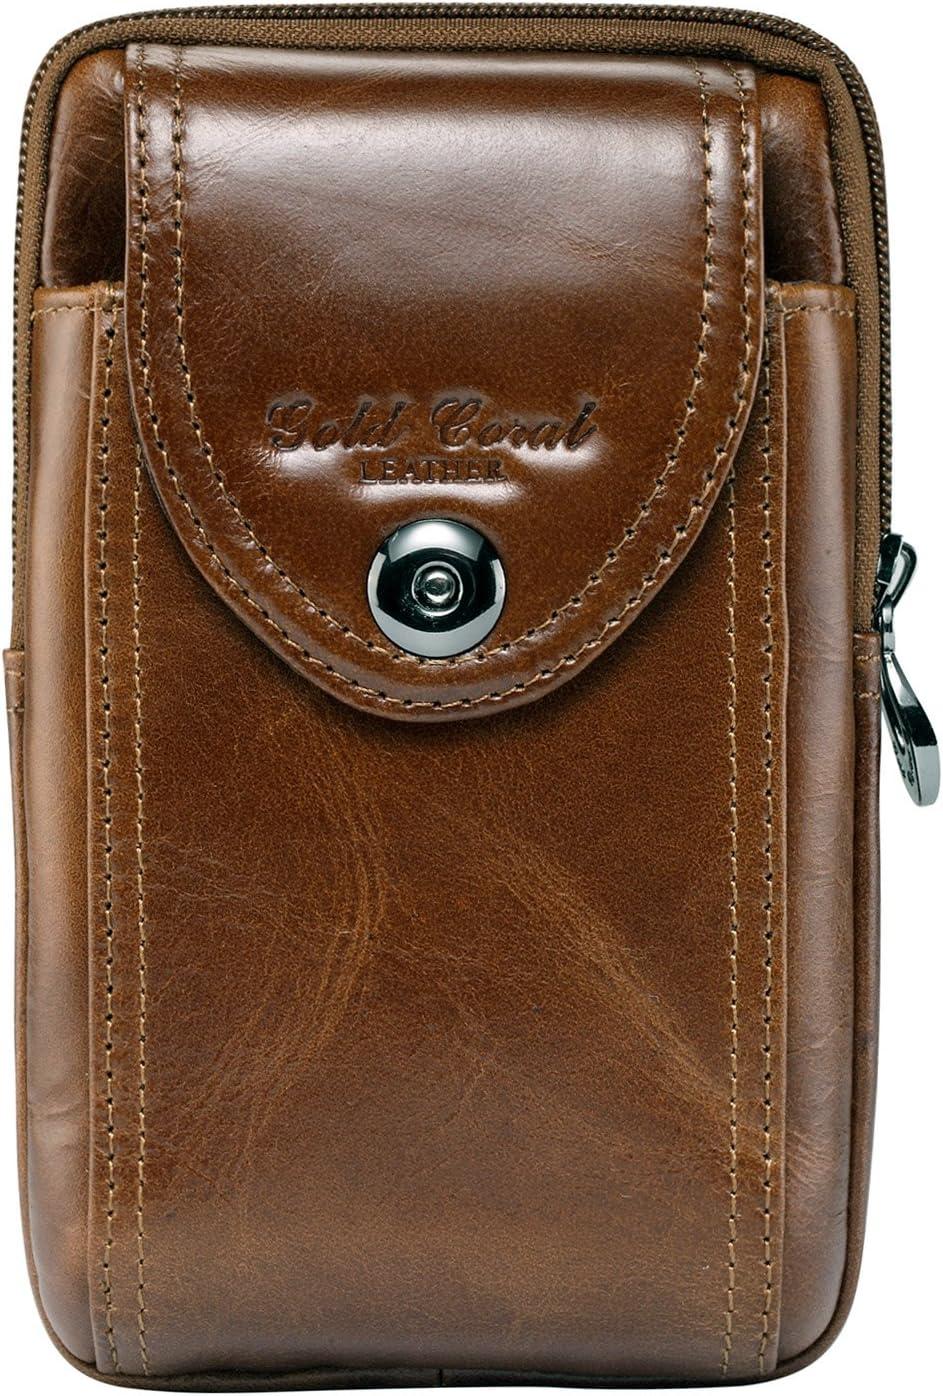 Sunmig Men Genuine Leather Cell Phone Belt Loop Holster Case Belt Waist Bag Pouch Purse Wallet